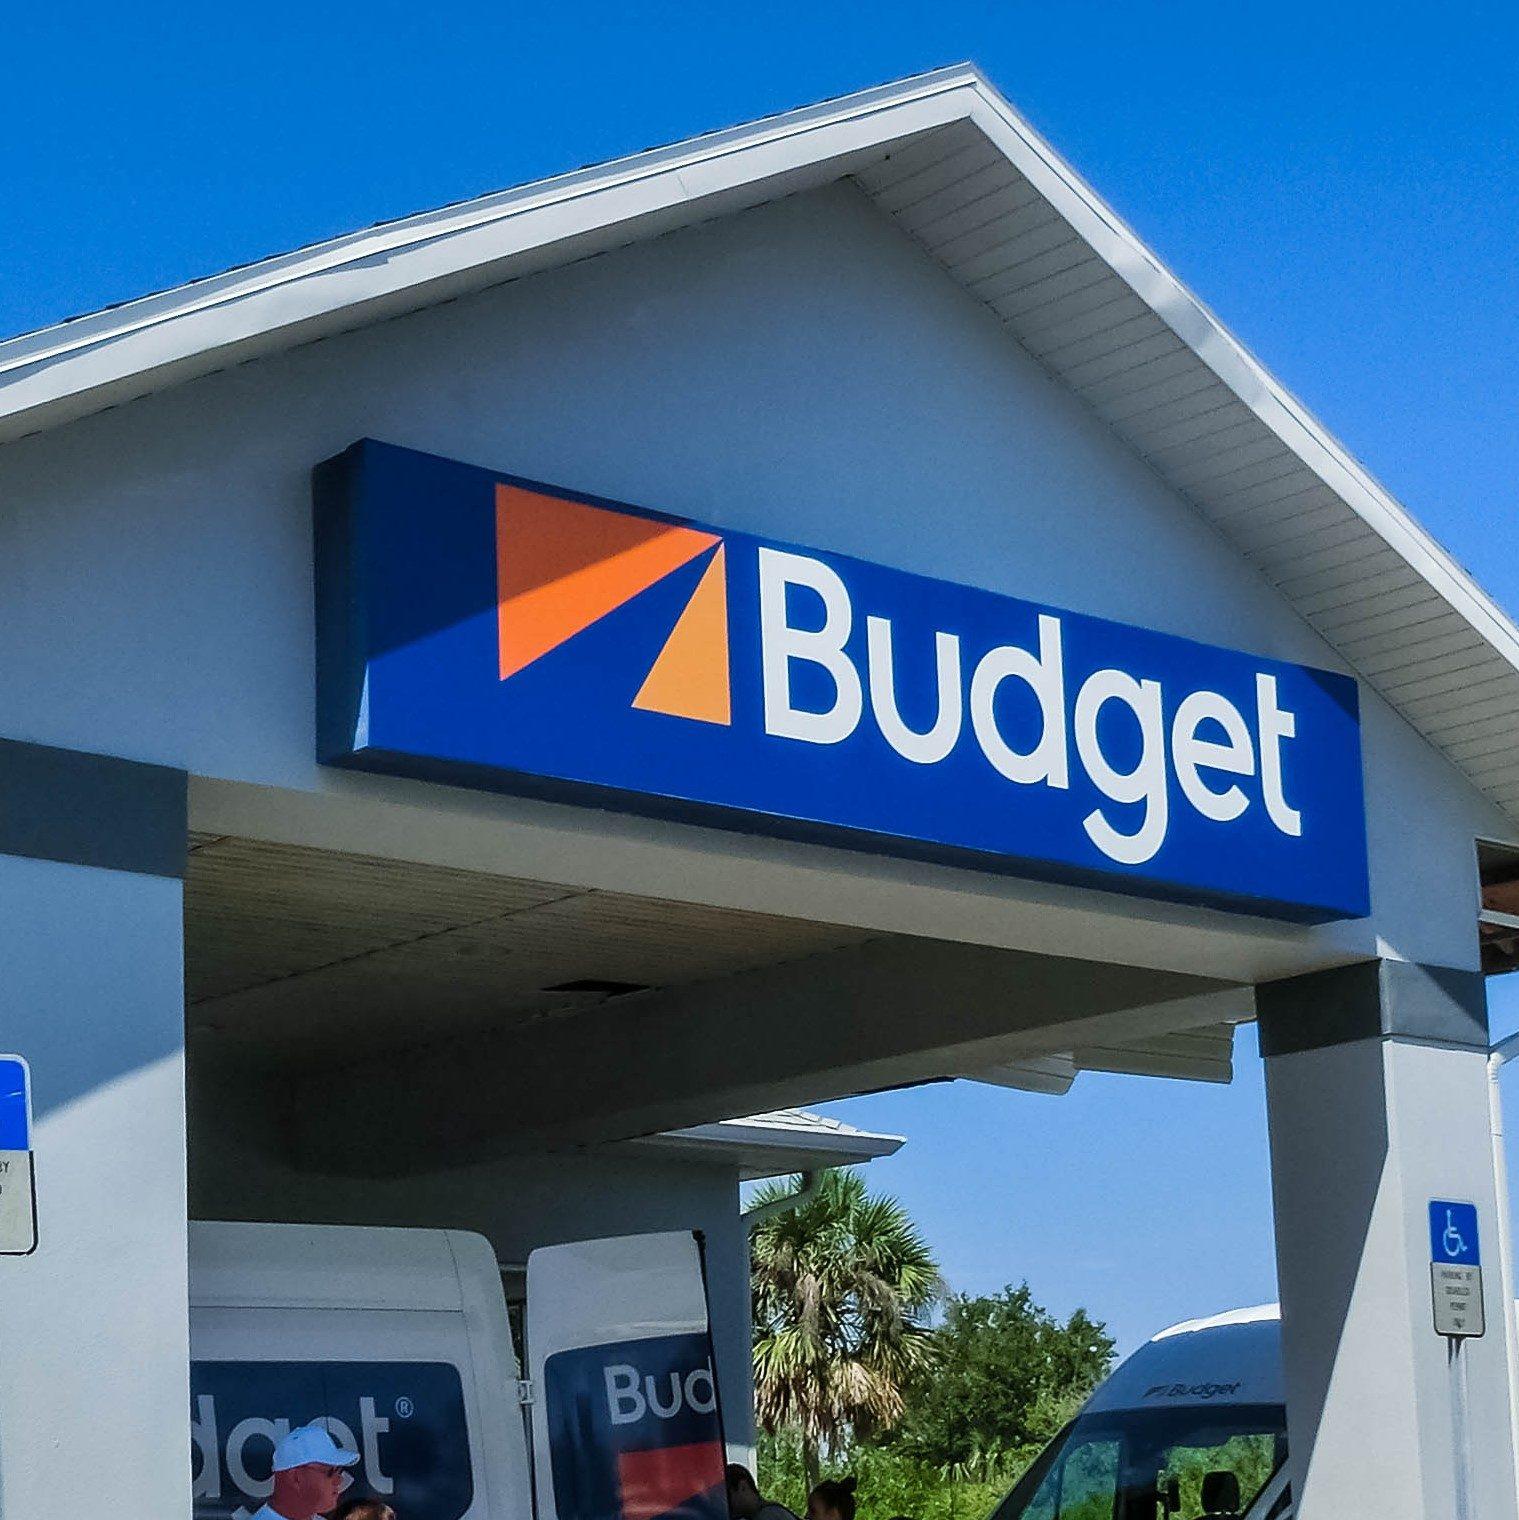 Budget Rental Car - Square